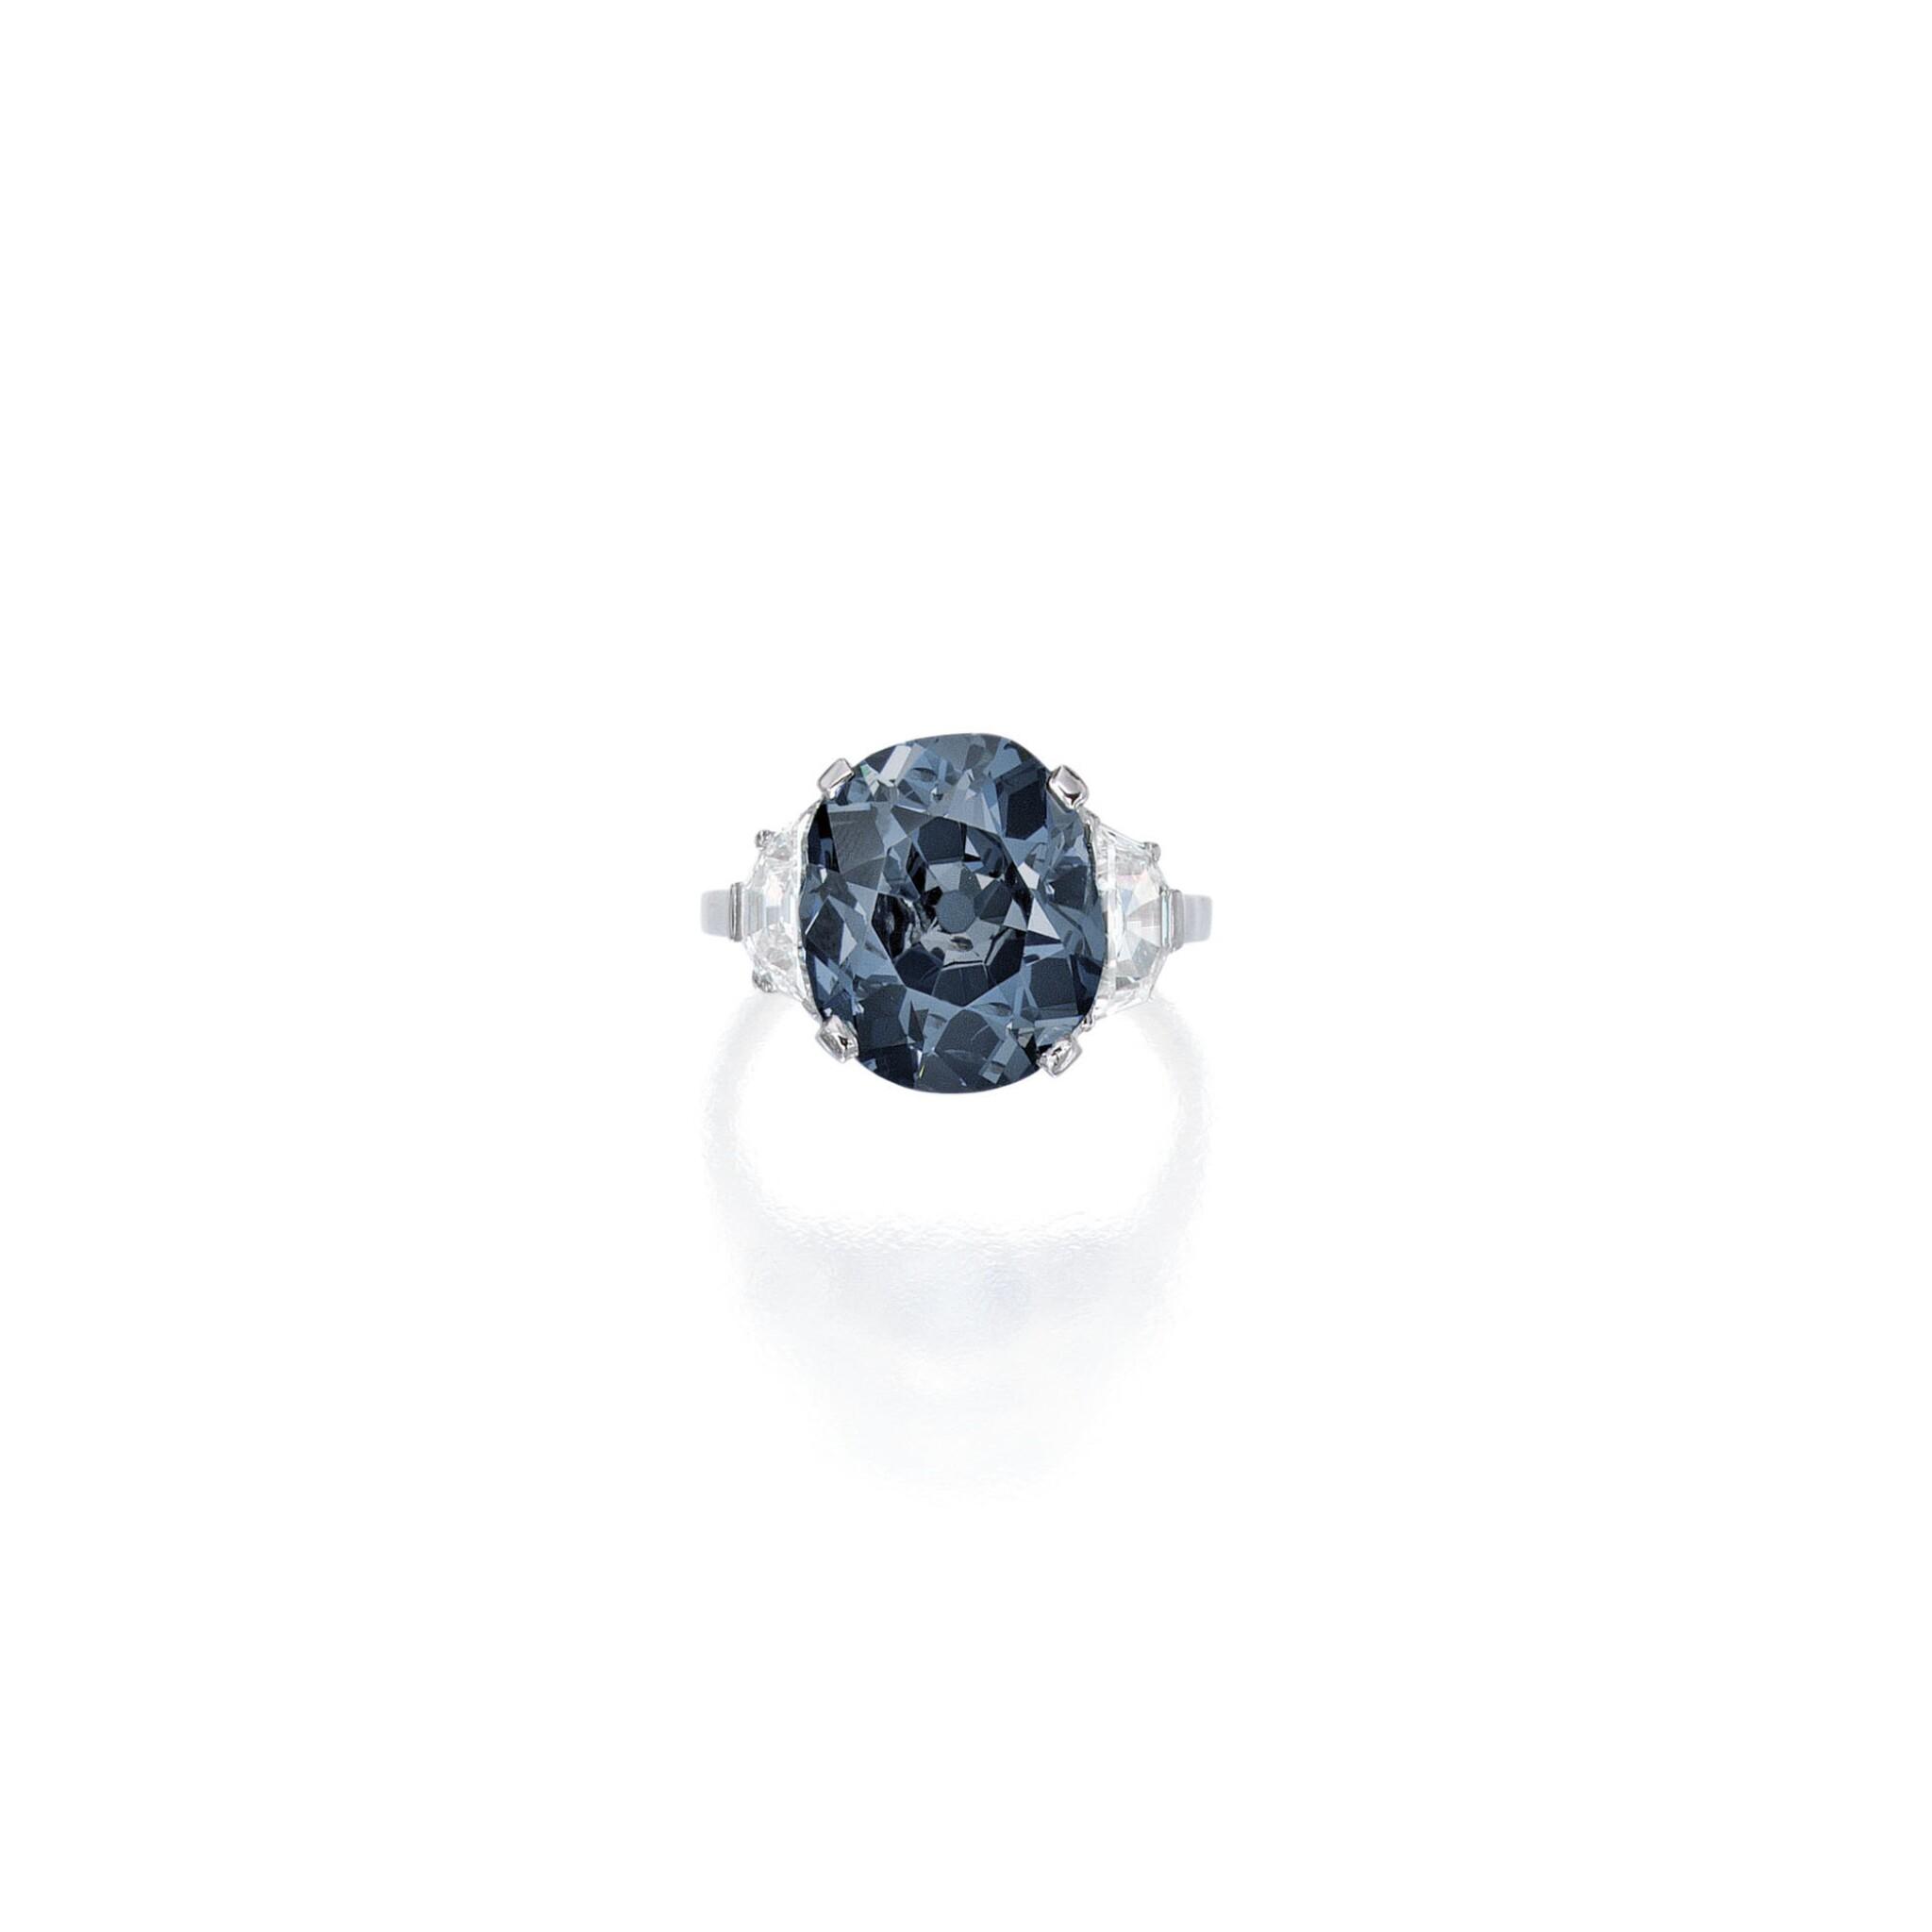 View full screen - View 1 of Lot 500. 'THE INDIAN BLUE,' AN ENCHANTING FANCY DEEP GRAYISH BLUE DIAMOND AND DIAMOND RING | 深彩灰藍色鑽石配鑽石戒指.